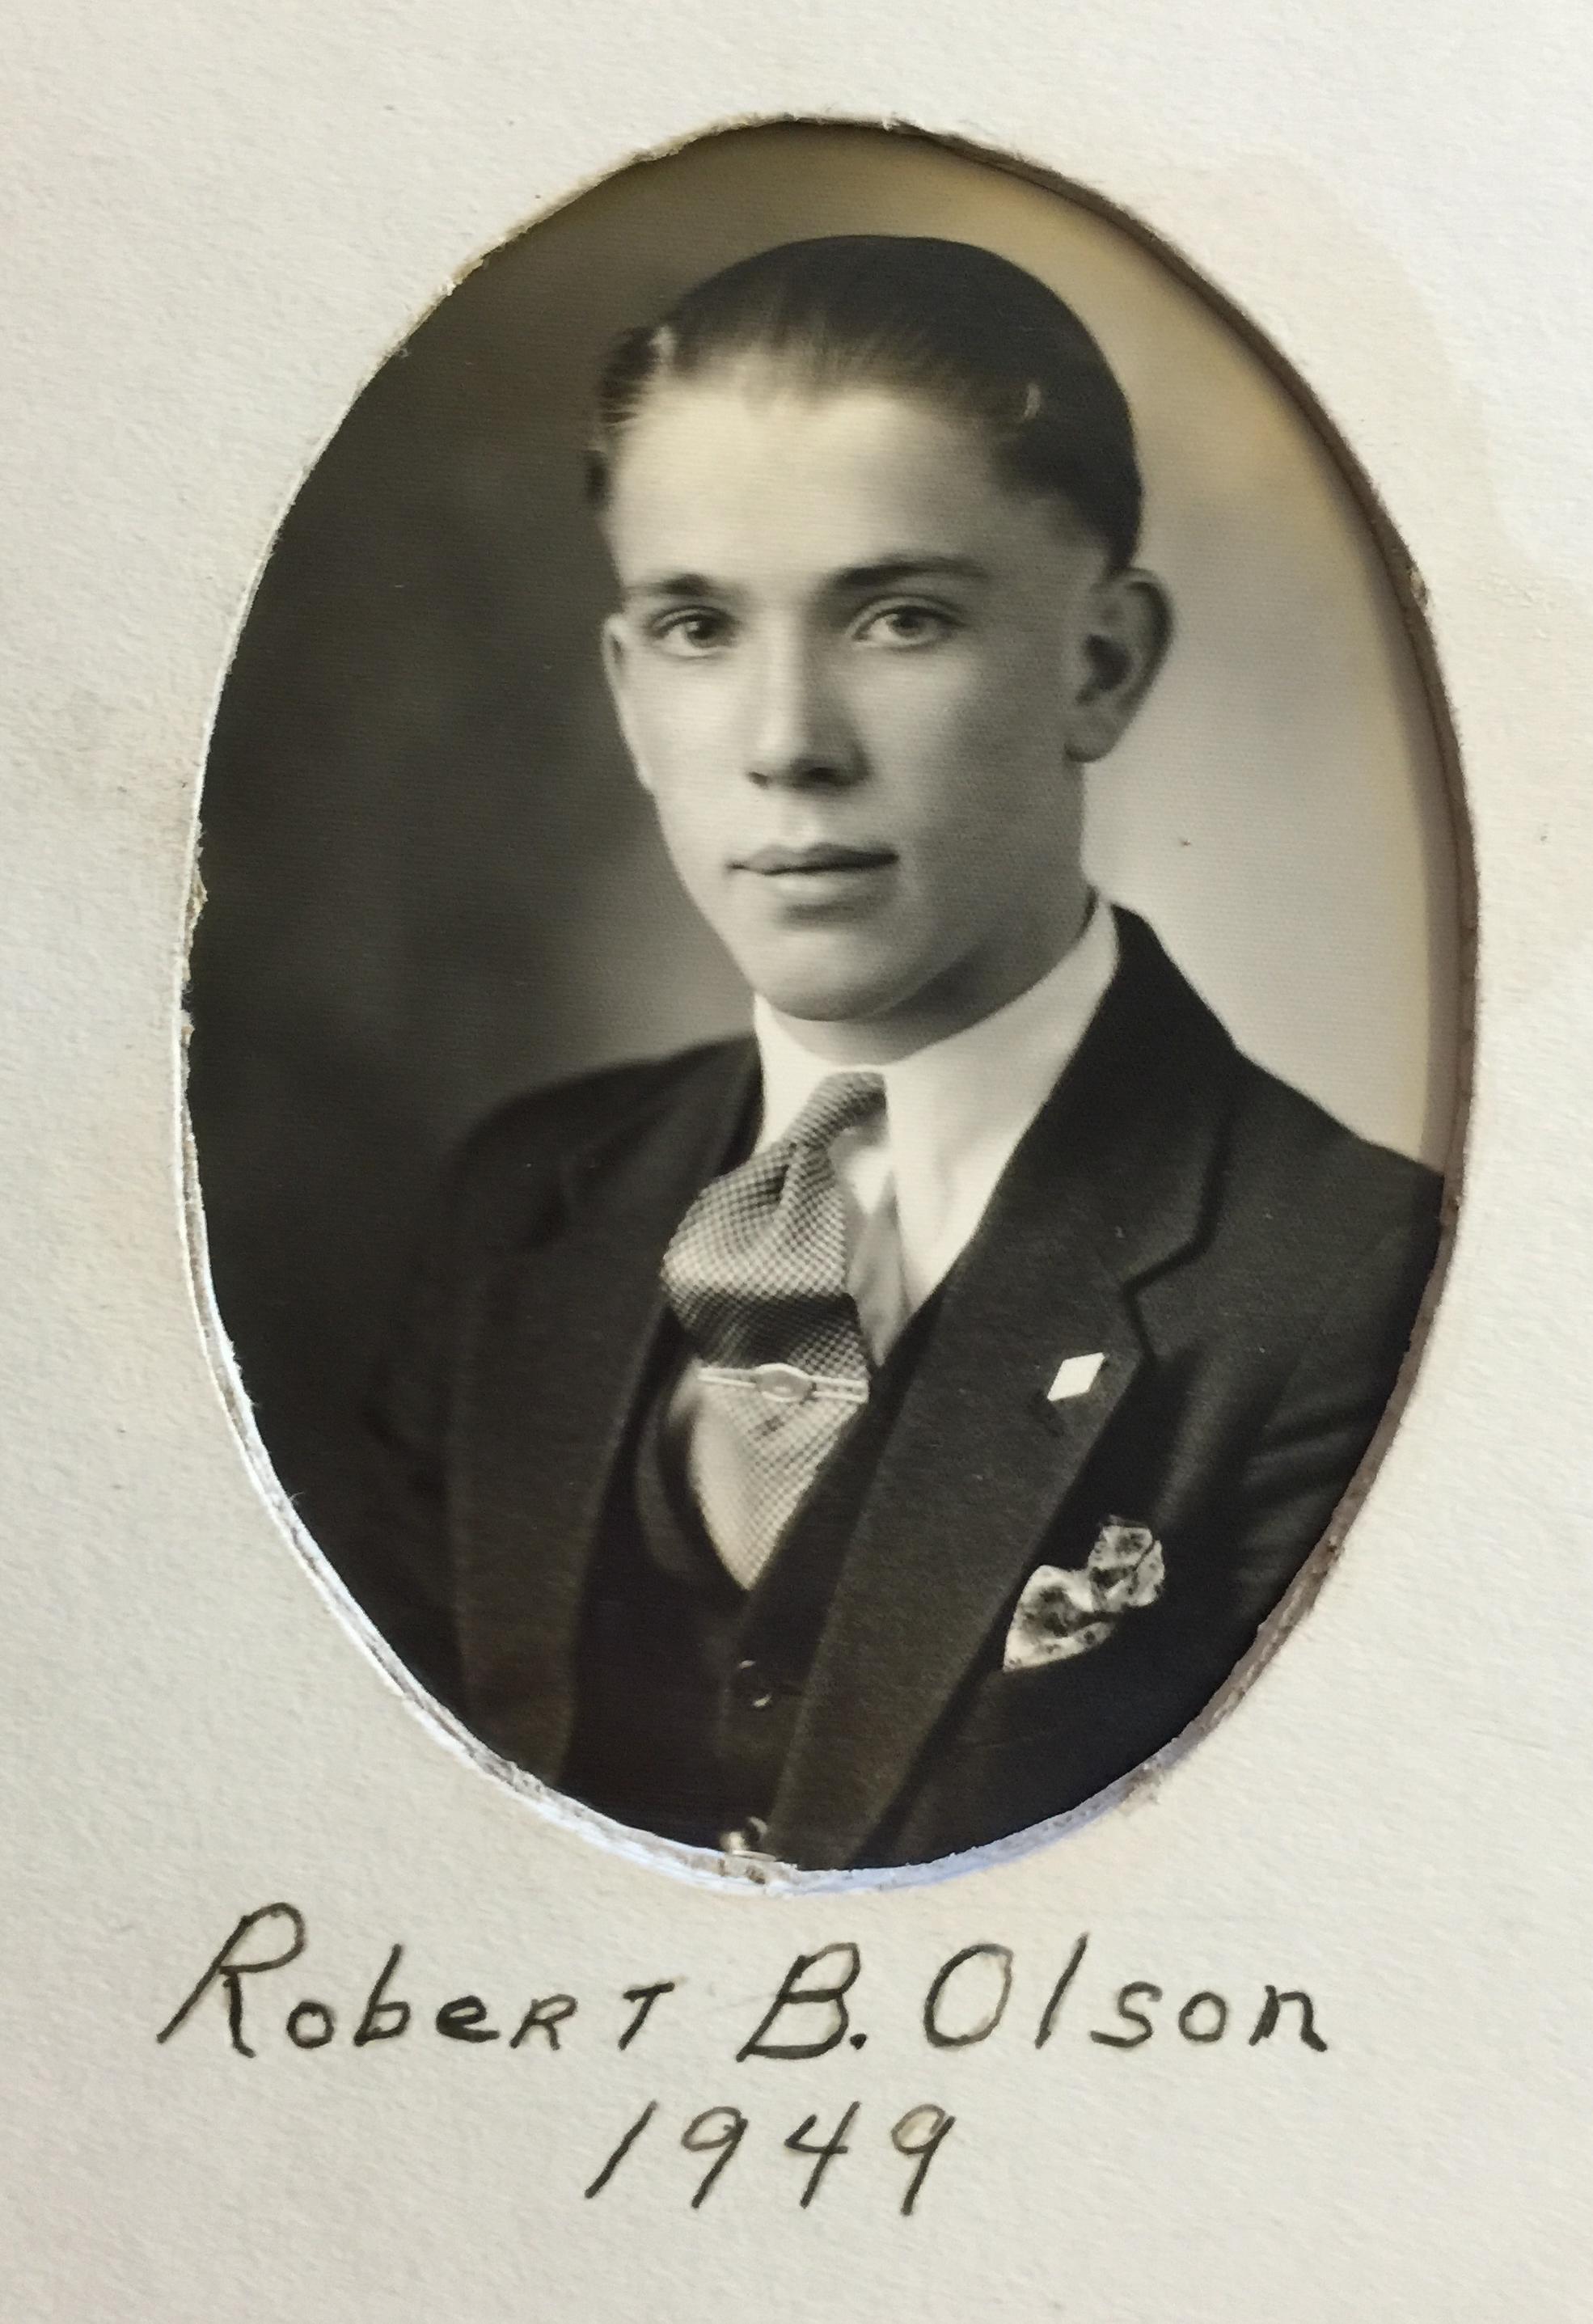 1949 Robert B. Olson